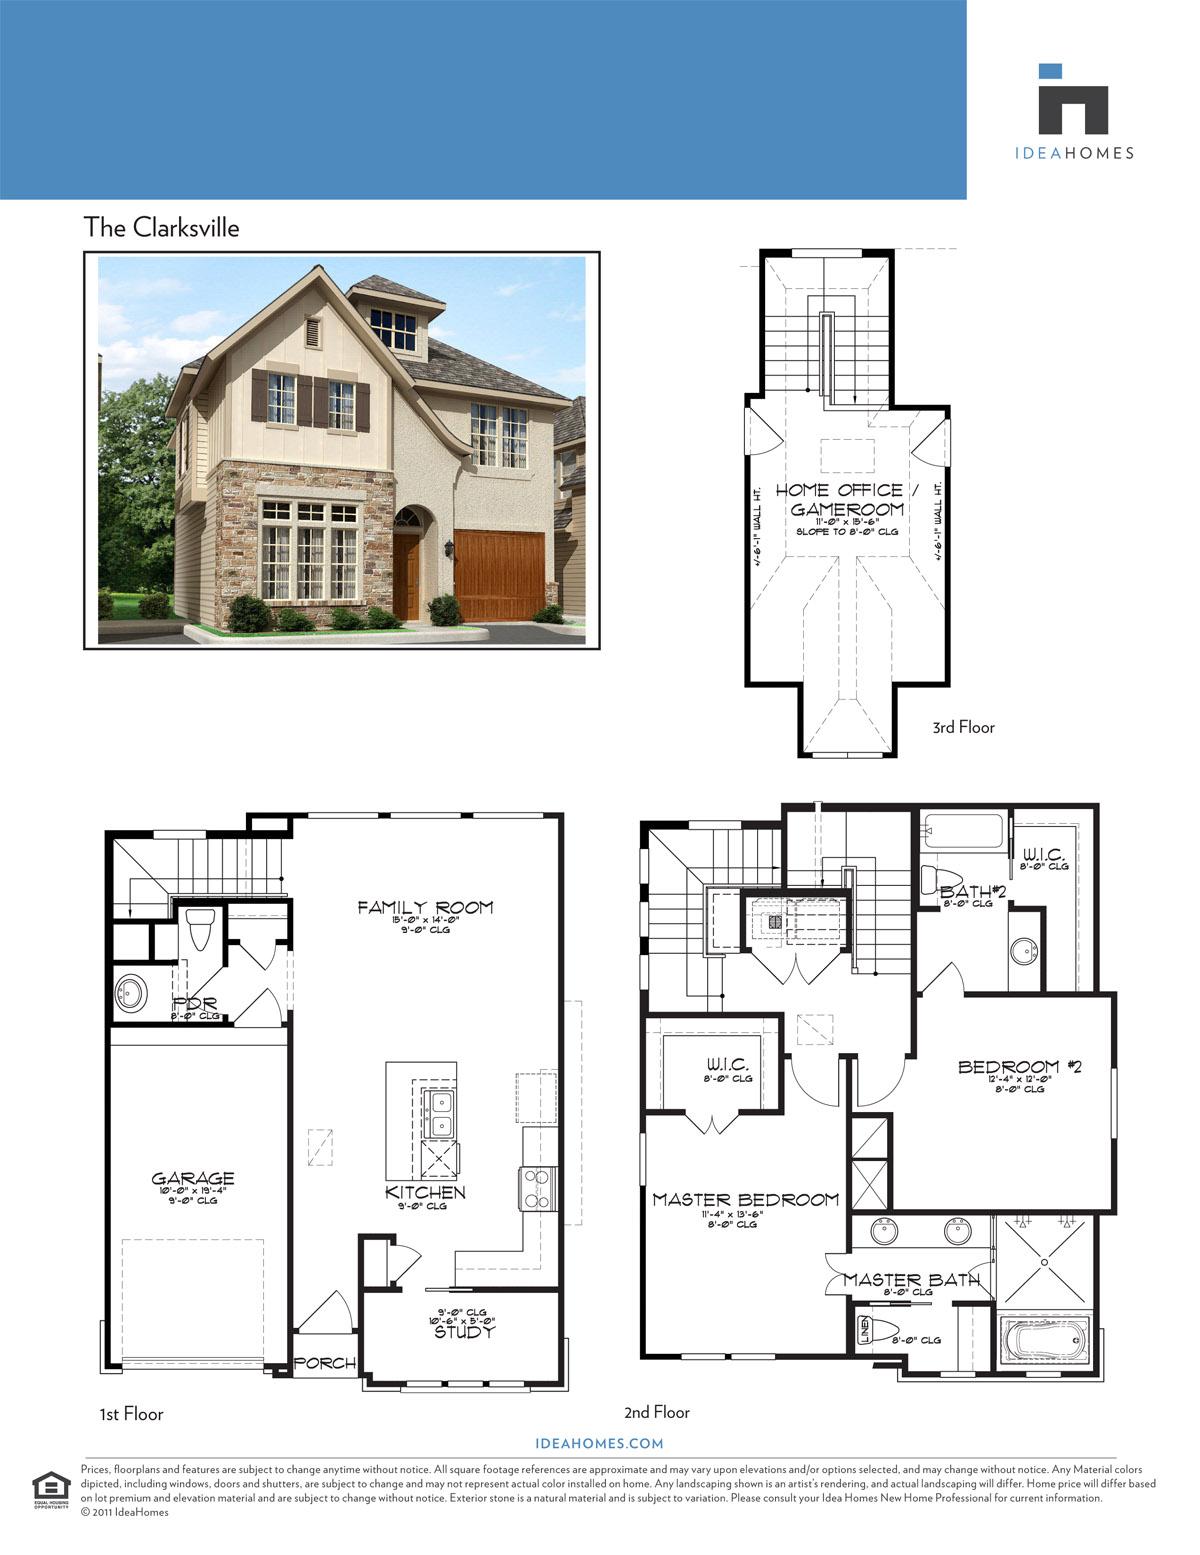 5309 Jeff Davis Avenue, Austin, TX 78756 for Sale   Condo.com™.